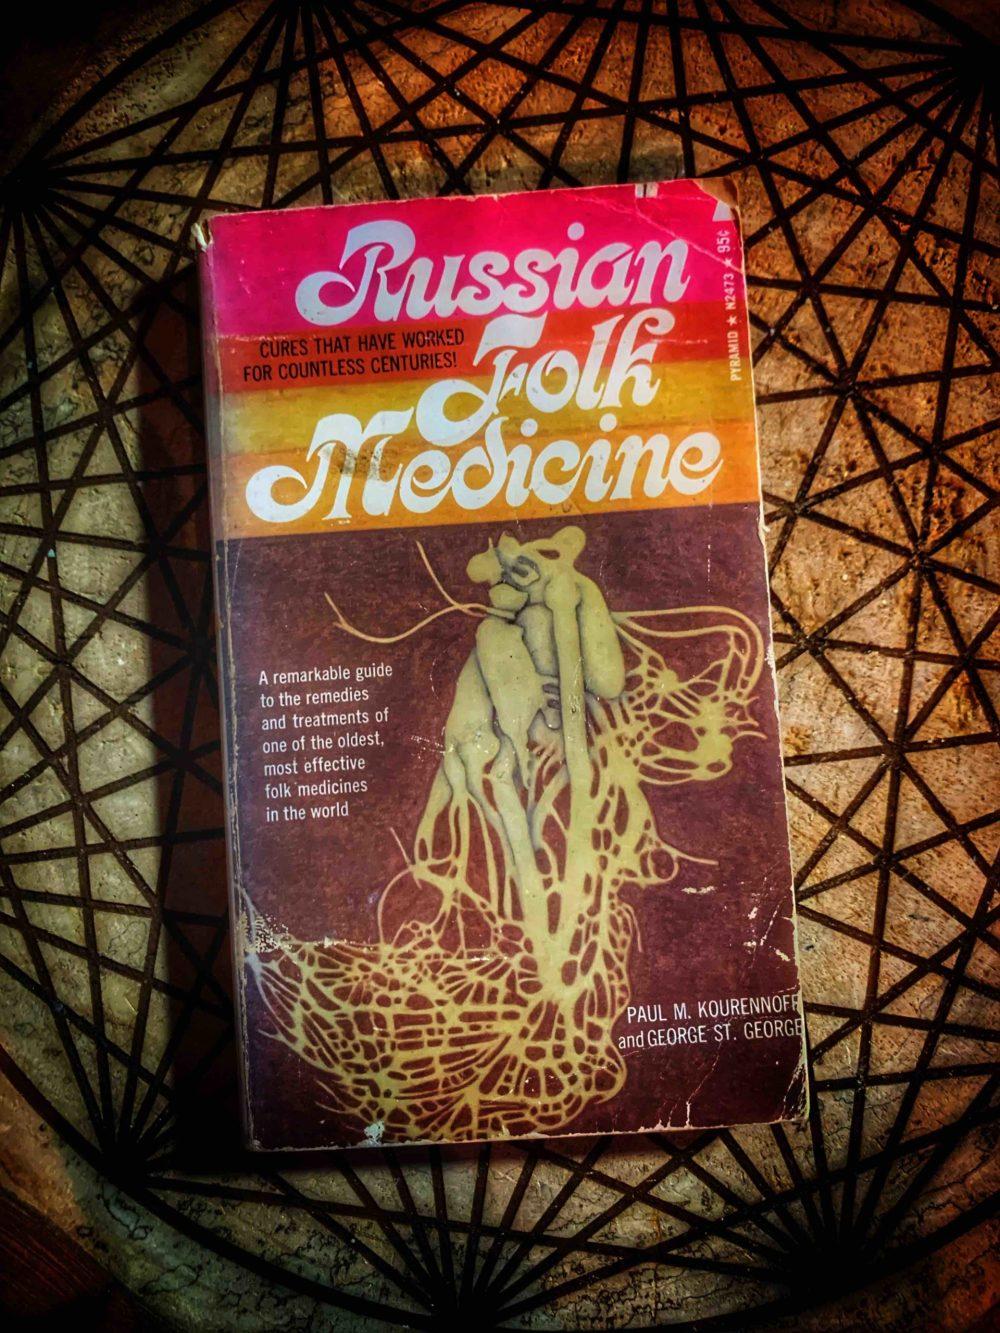 Russian Folk Medicine